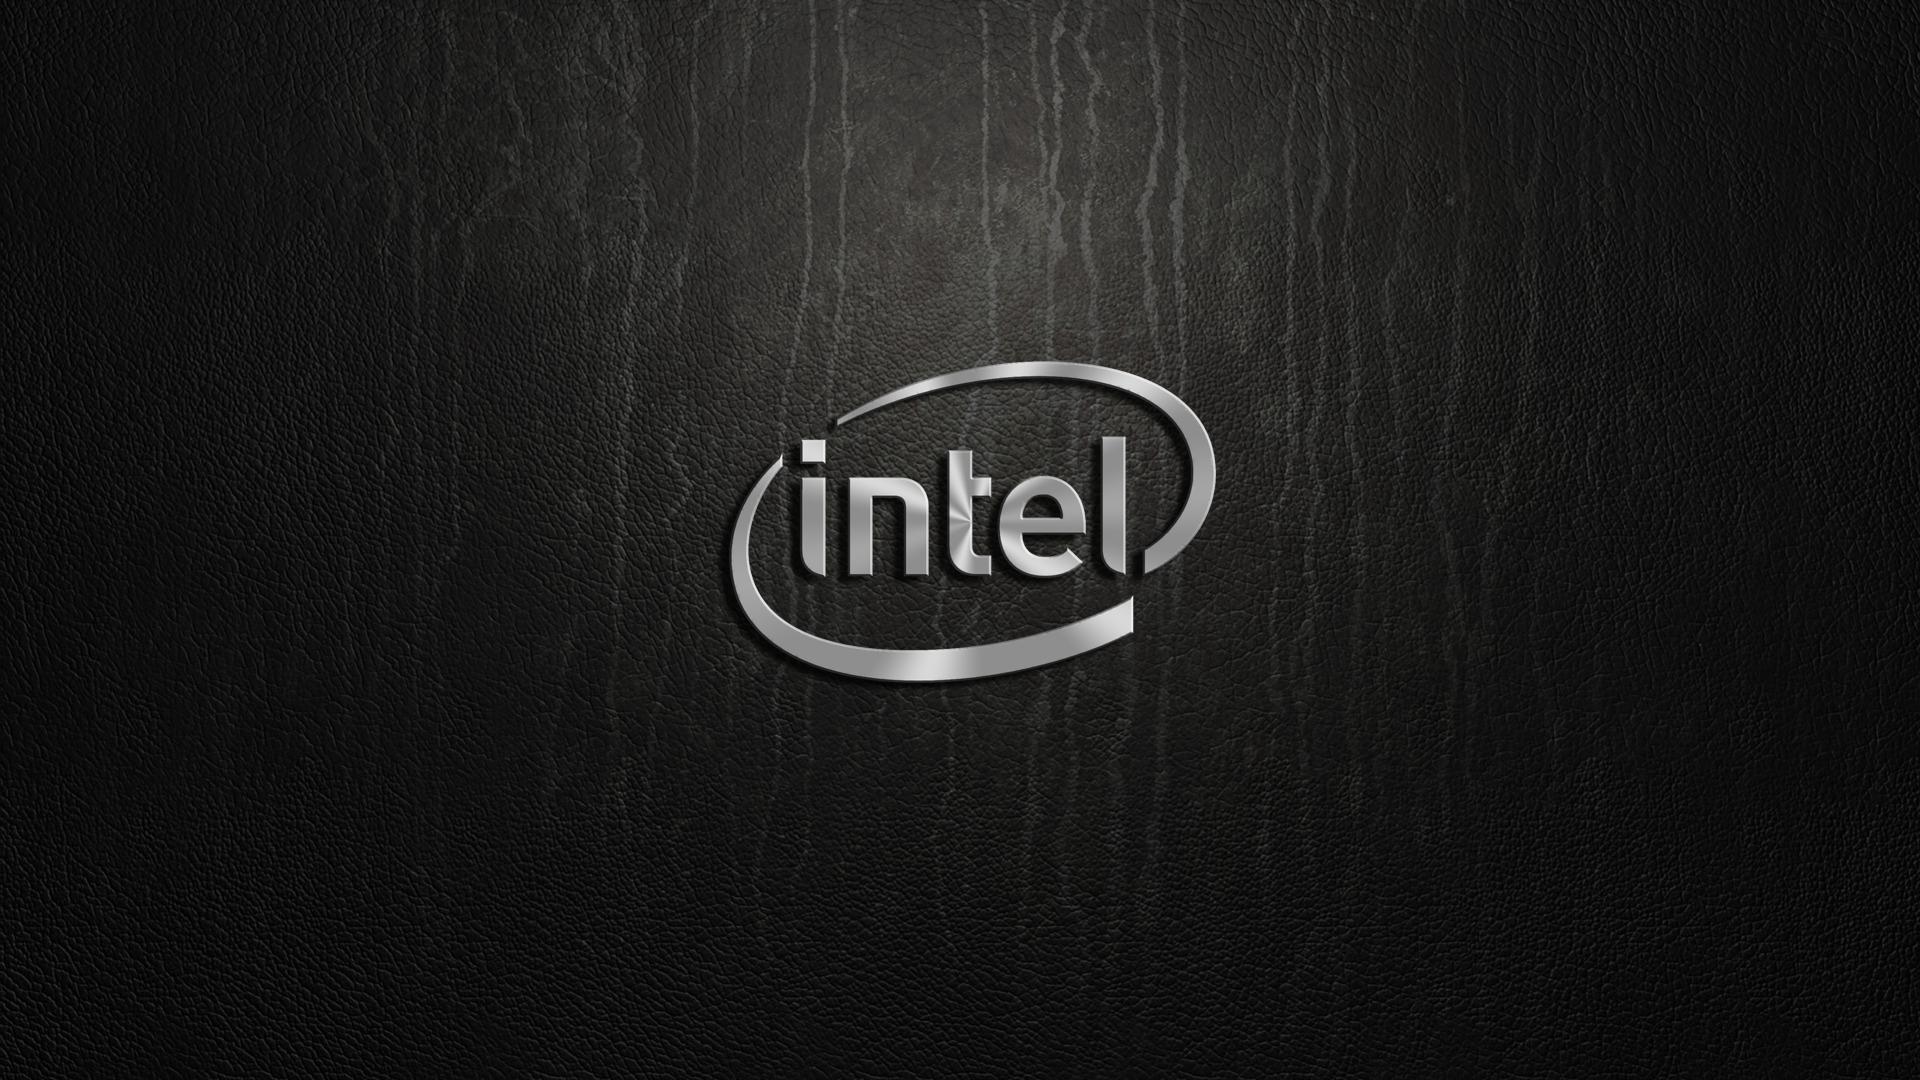 Intel logo Wallpaper 10096 1920x1080